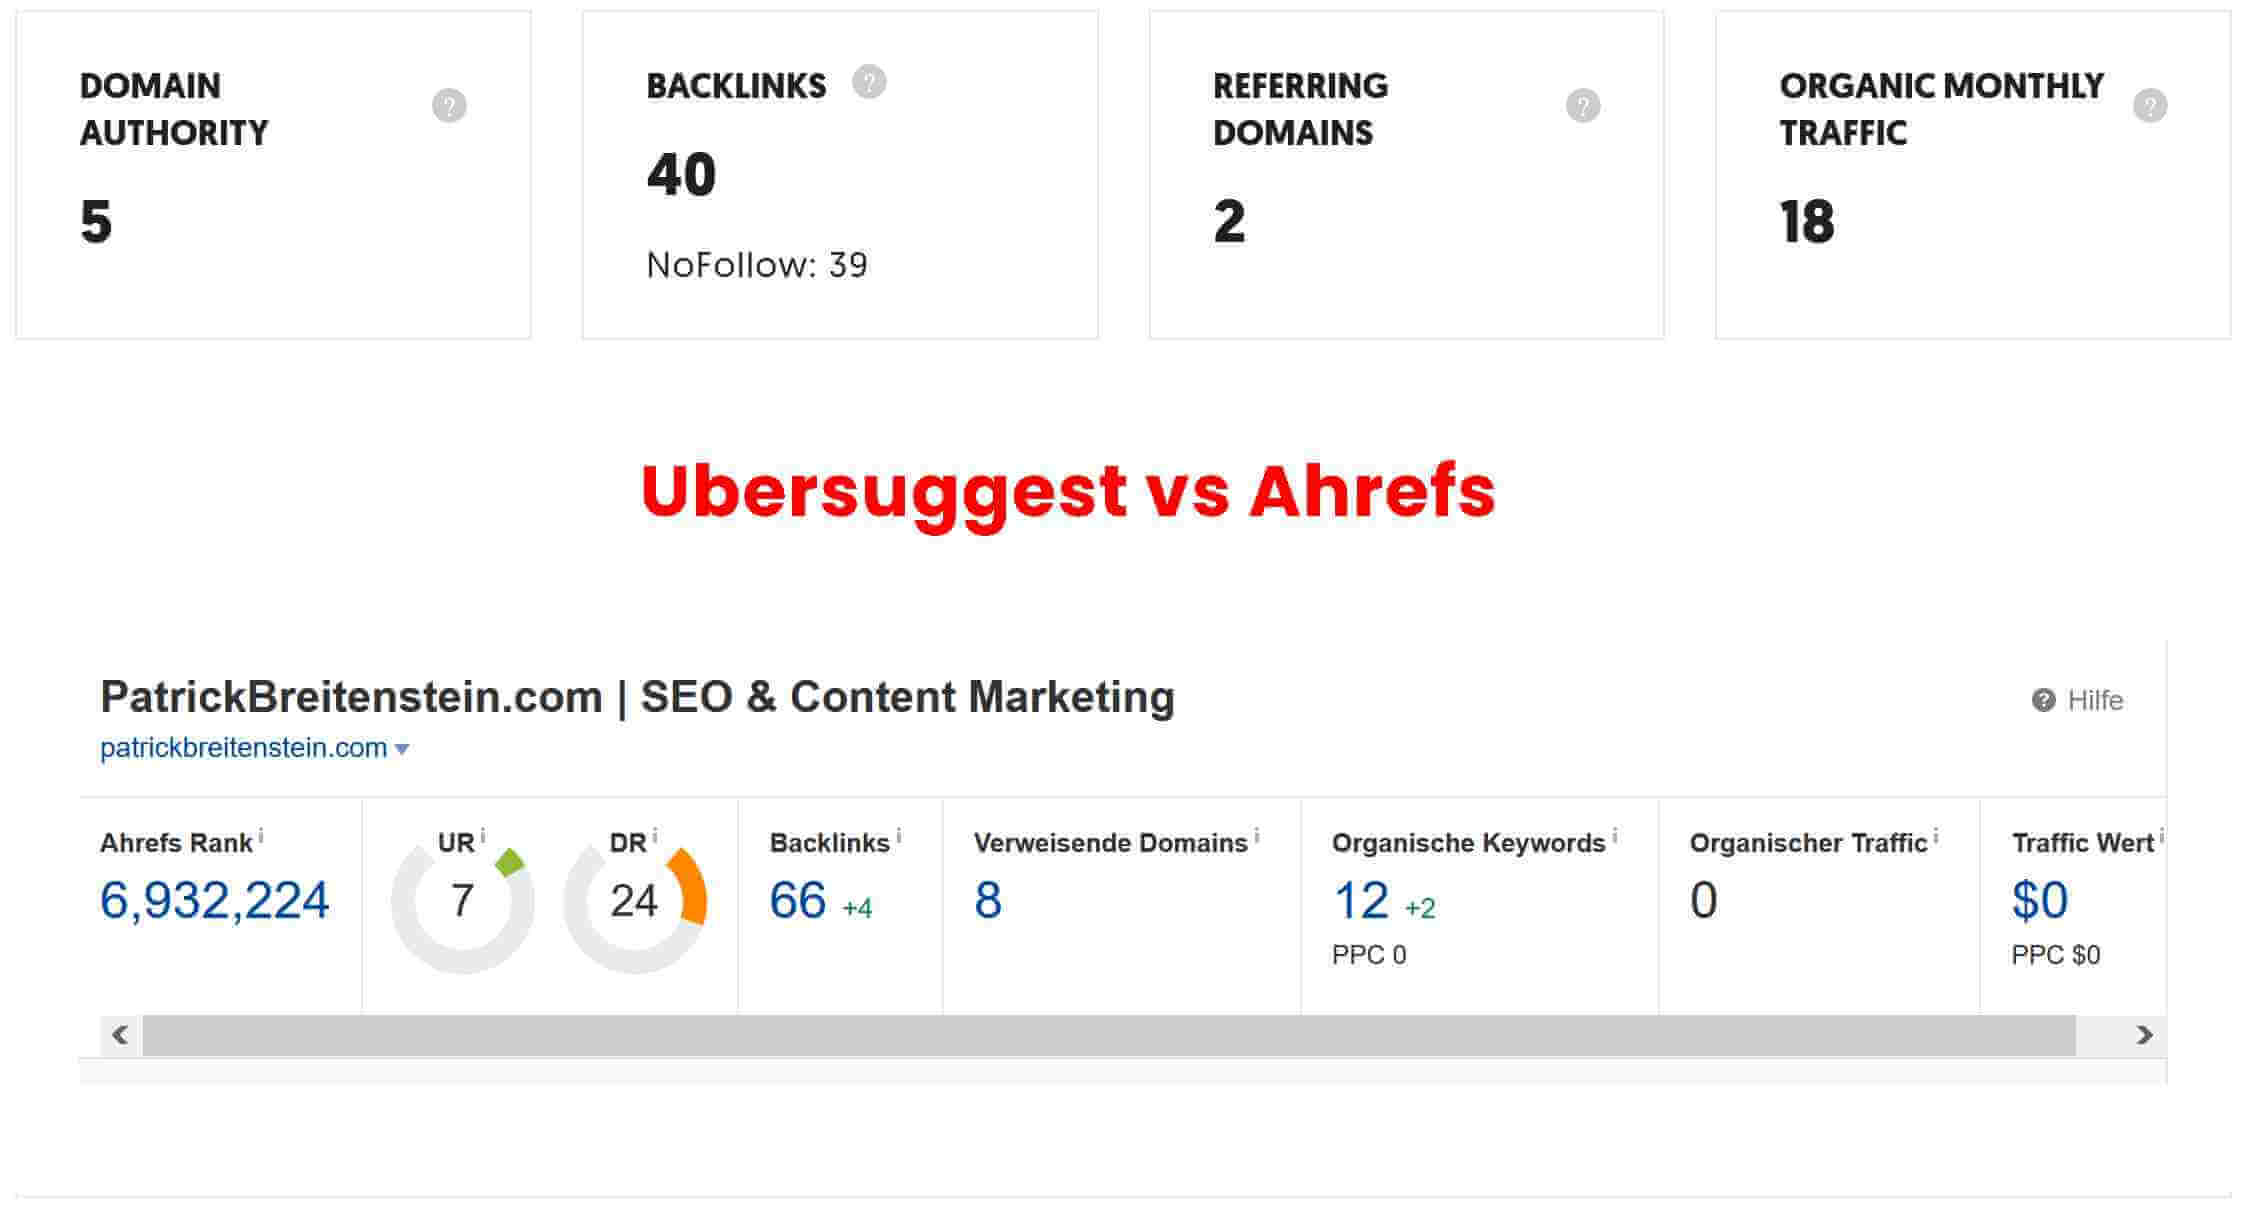 Ubersuggest Backlinkcheck vs Ahrefs